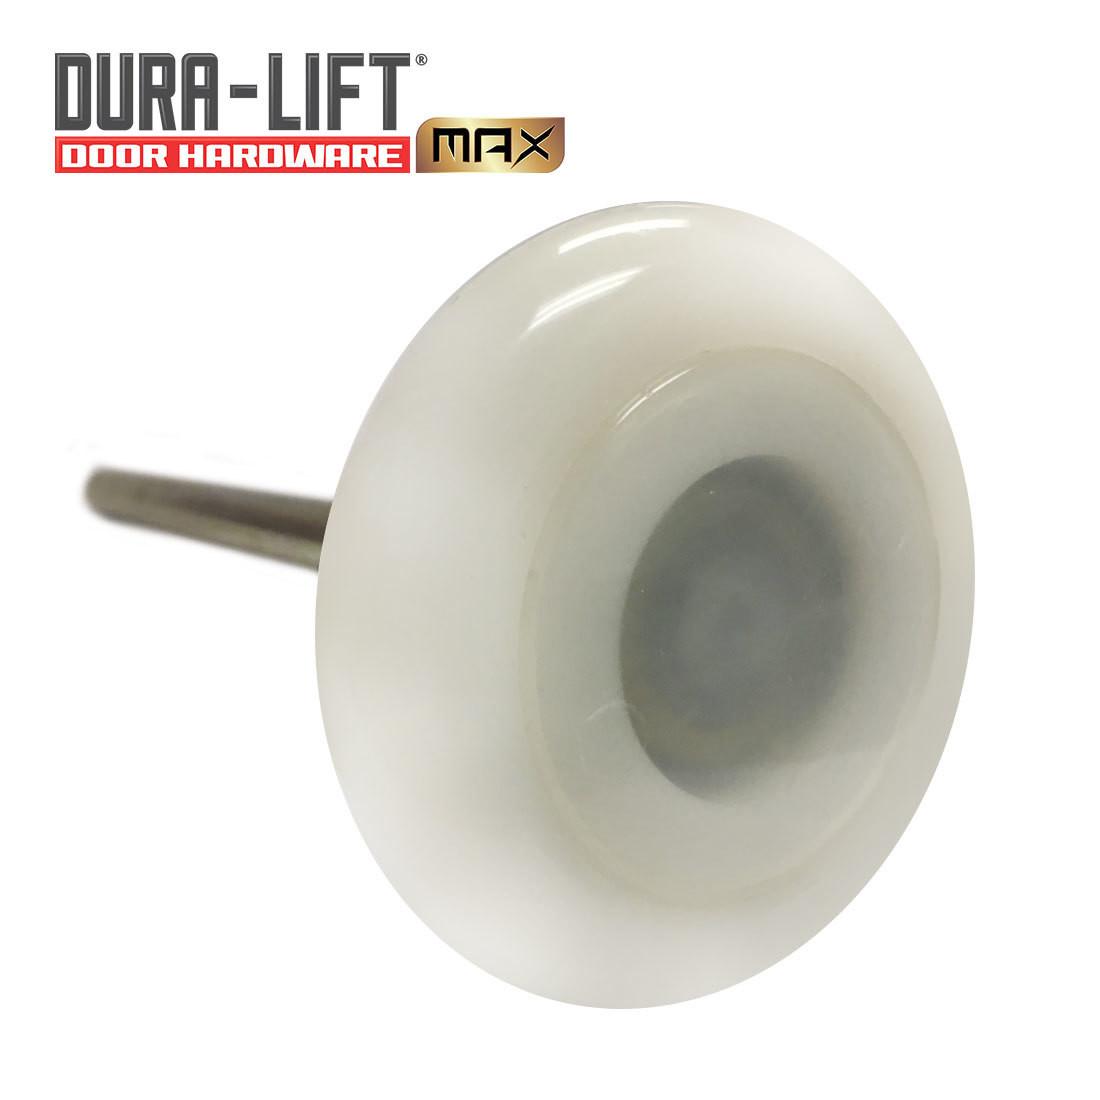 "DURA-LIFT Ultra-Life MAX 3"" 6201ZZ Nylon Garage Door Roller 7"" Stem (10-Pack)"